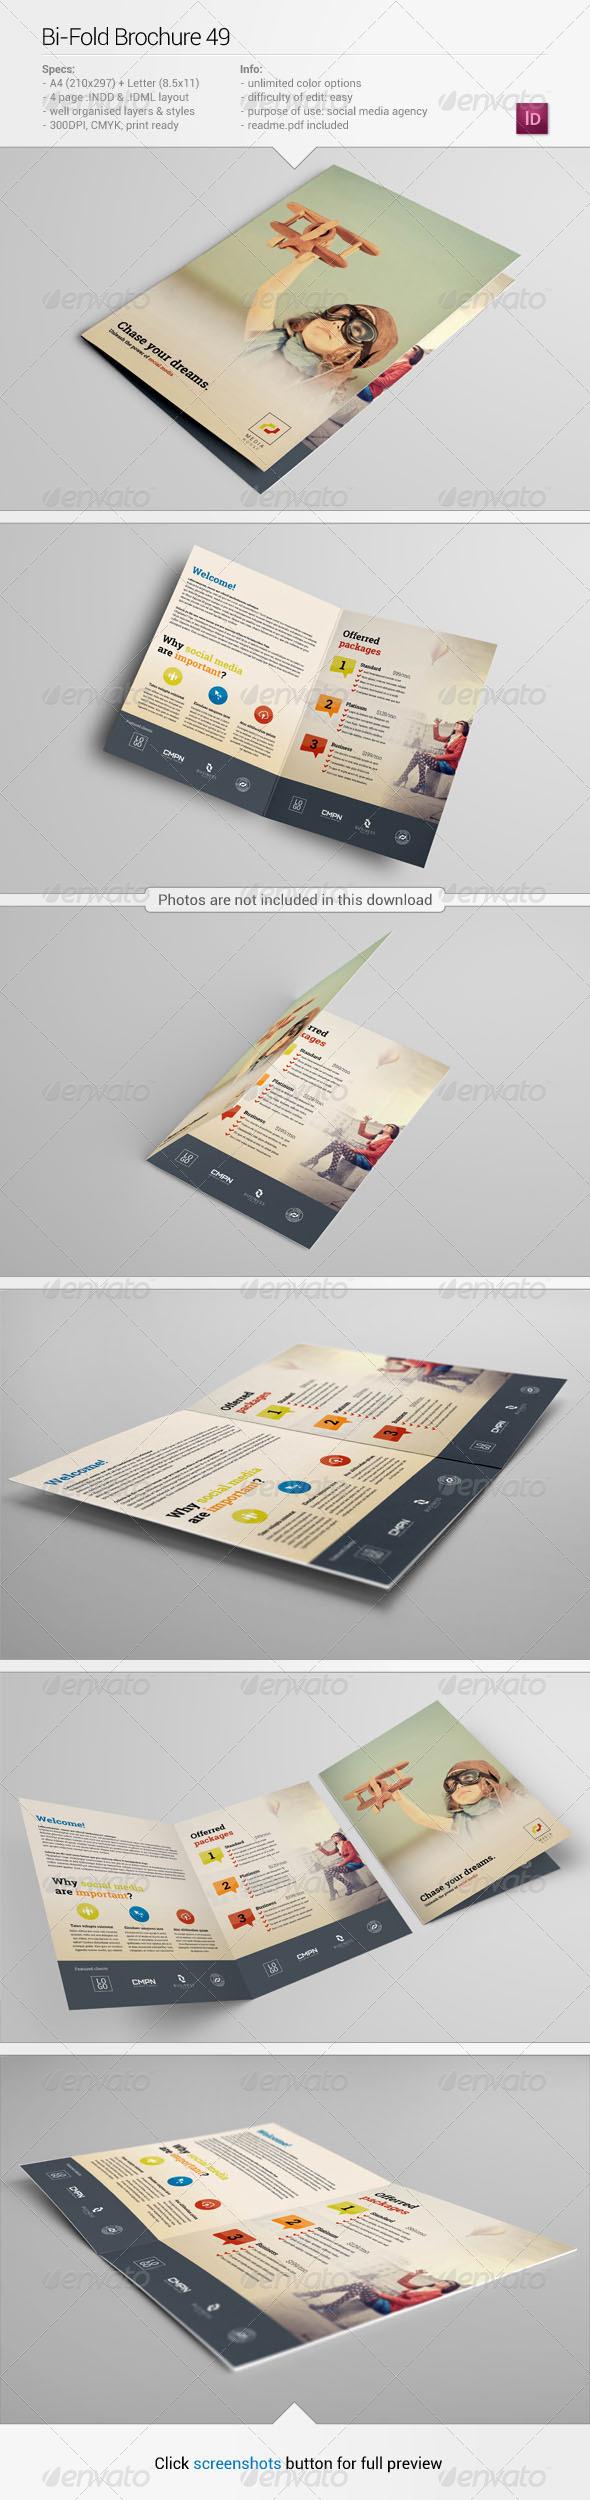 Bi-Fold Brochure 49 - Corporate Brochures